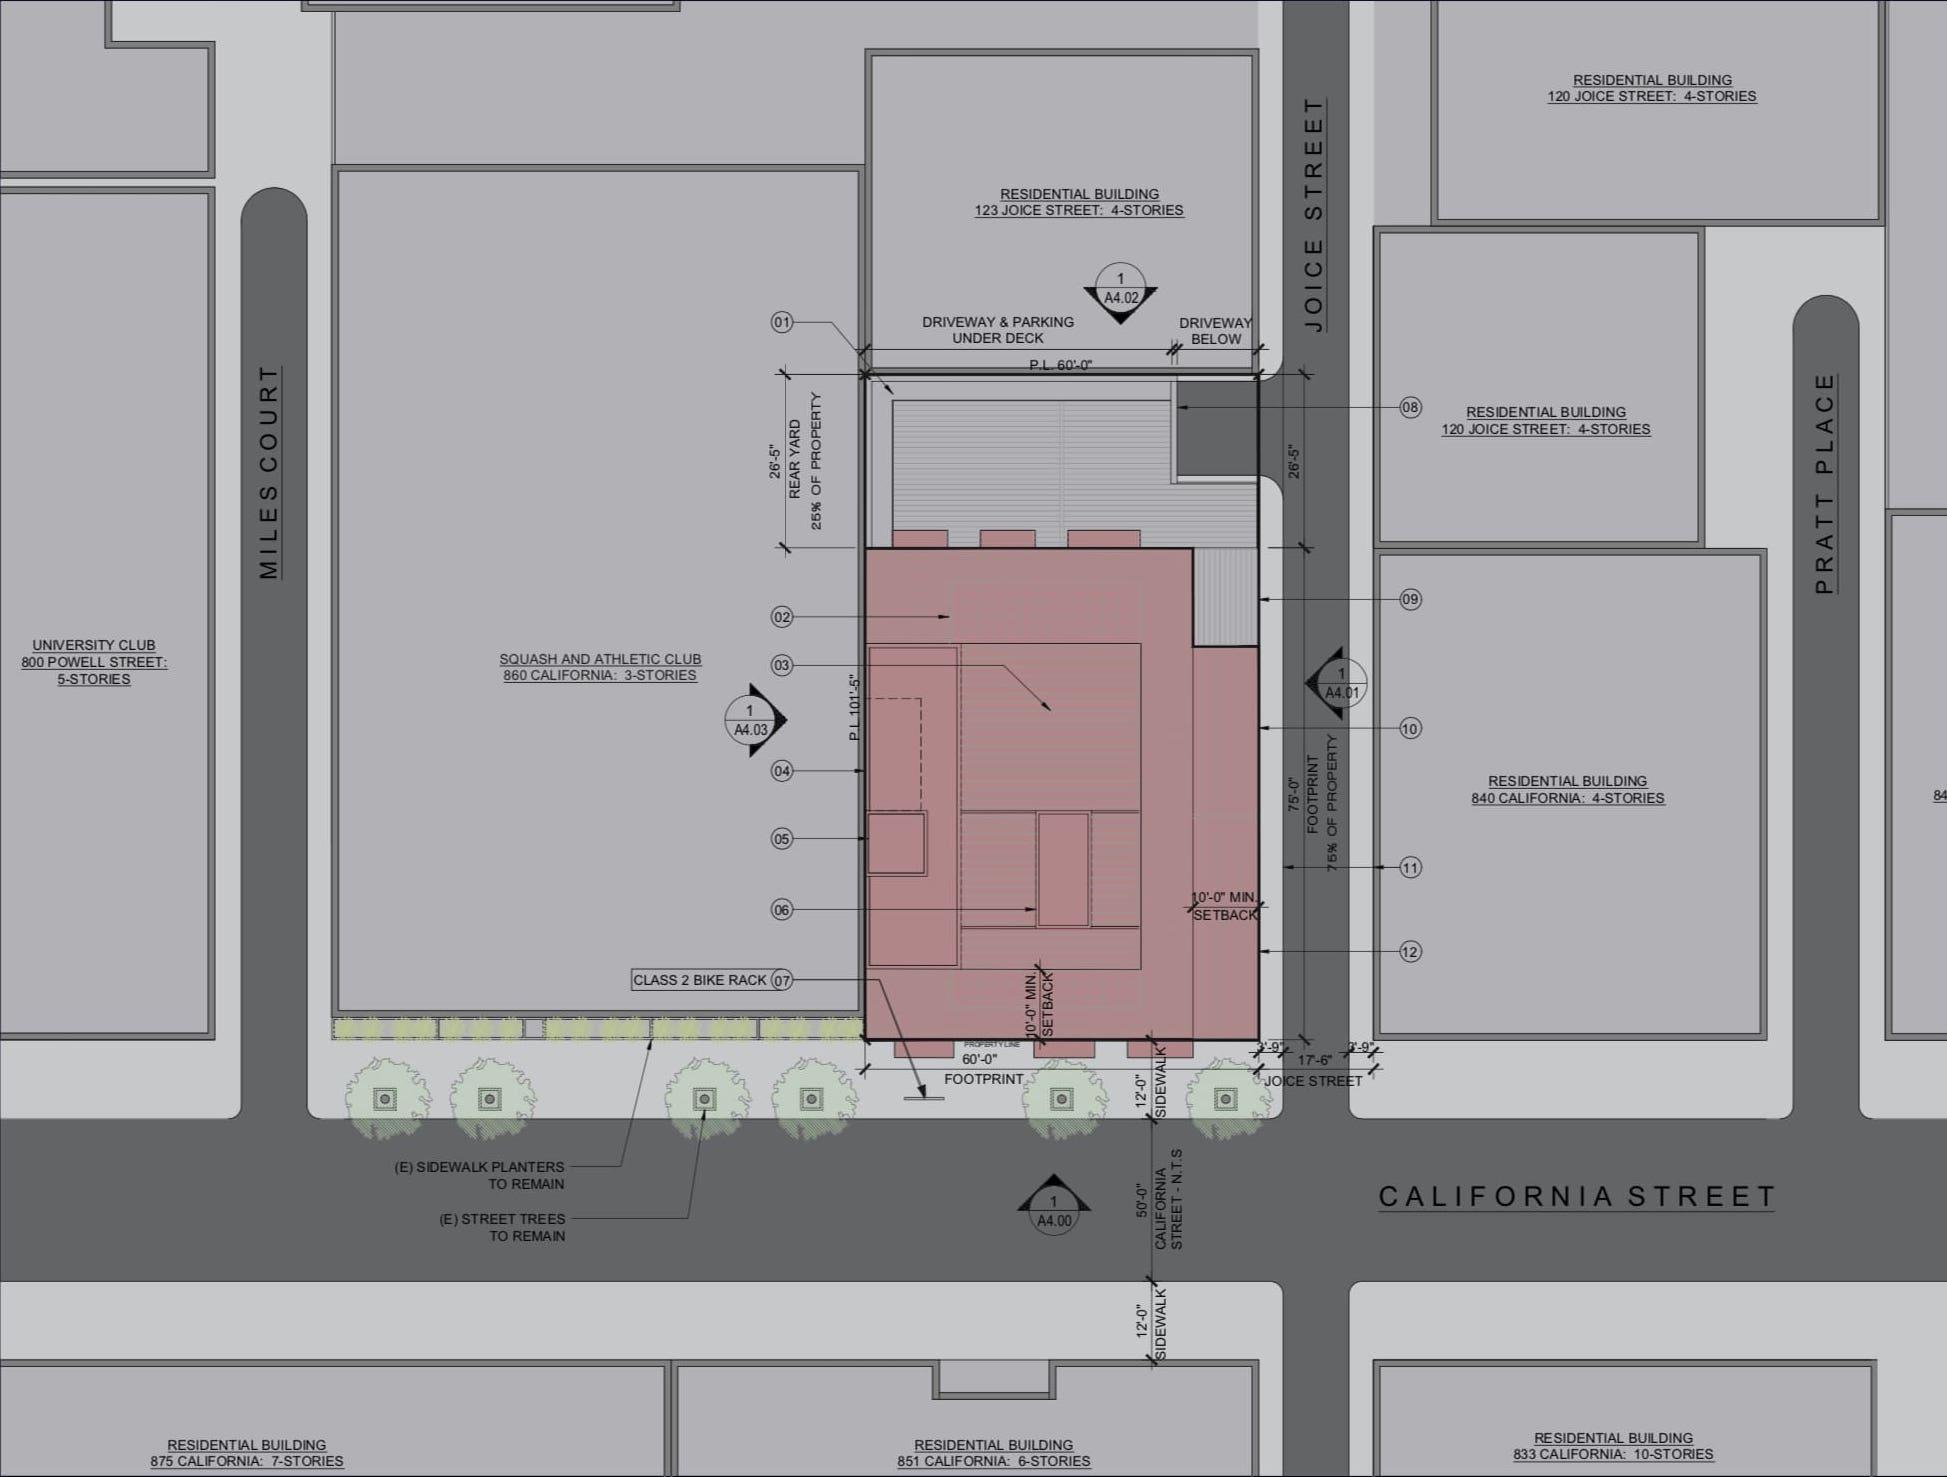 842 California St Site Plan